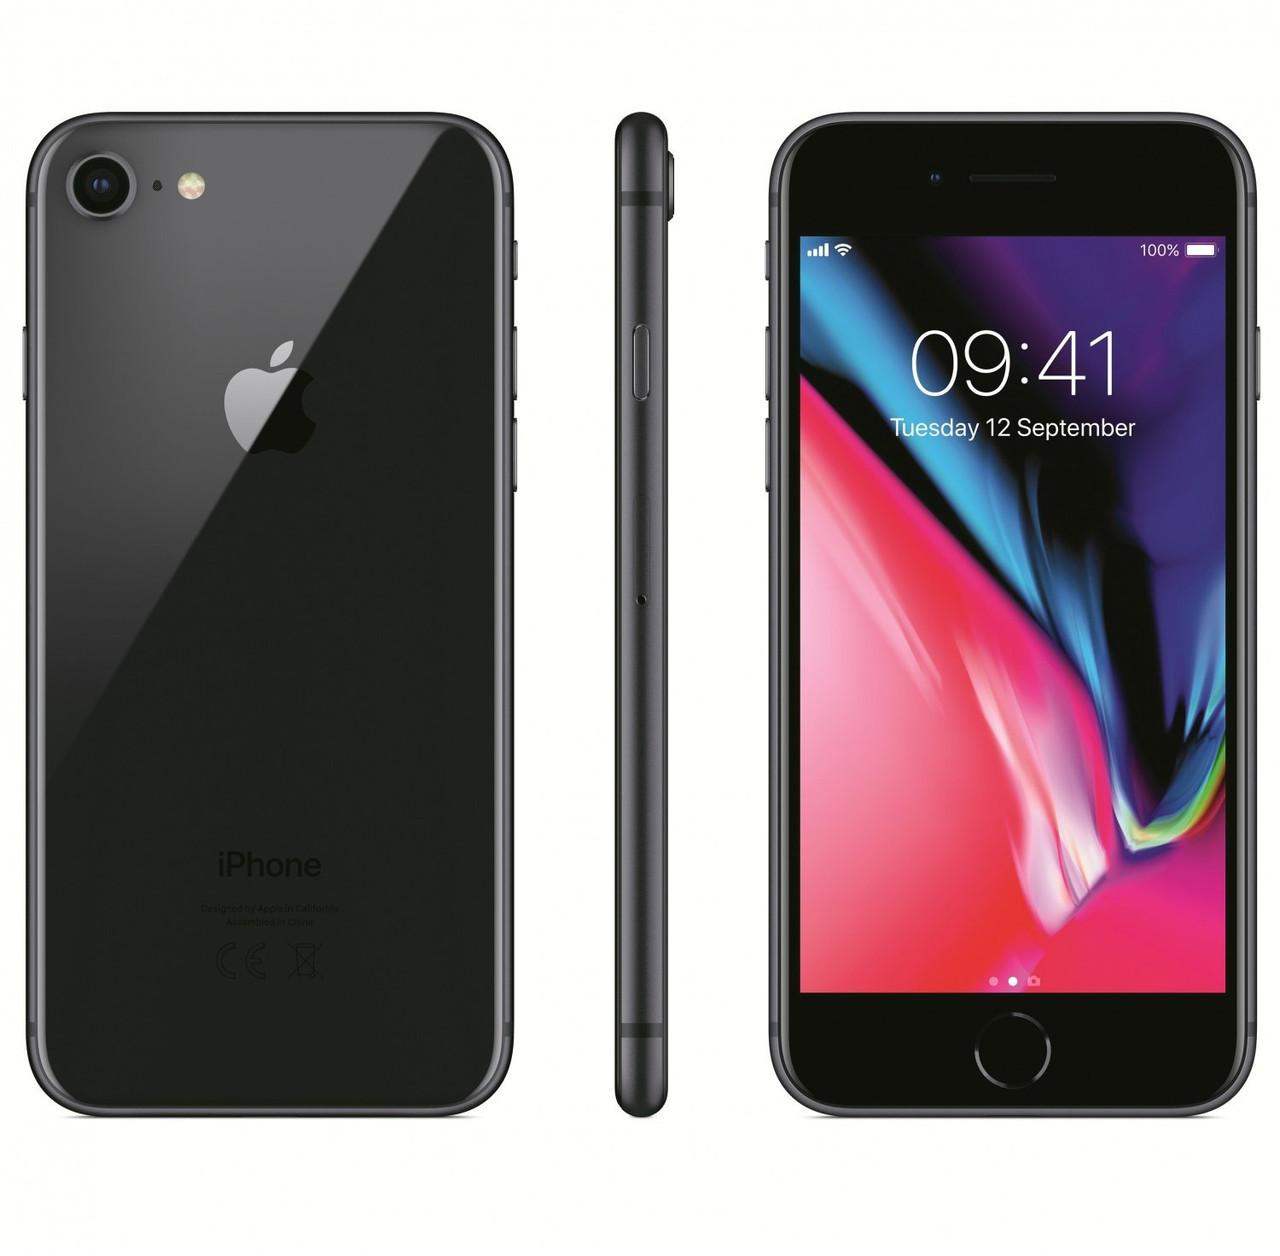 Смартфон Apple iPhone 8 64gb Space Gray Apple A11 Bionic 1820 мАч + чехол и стекло